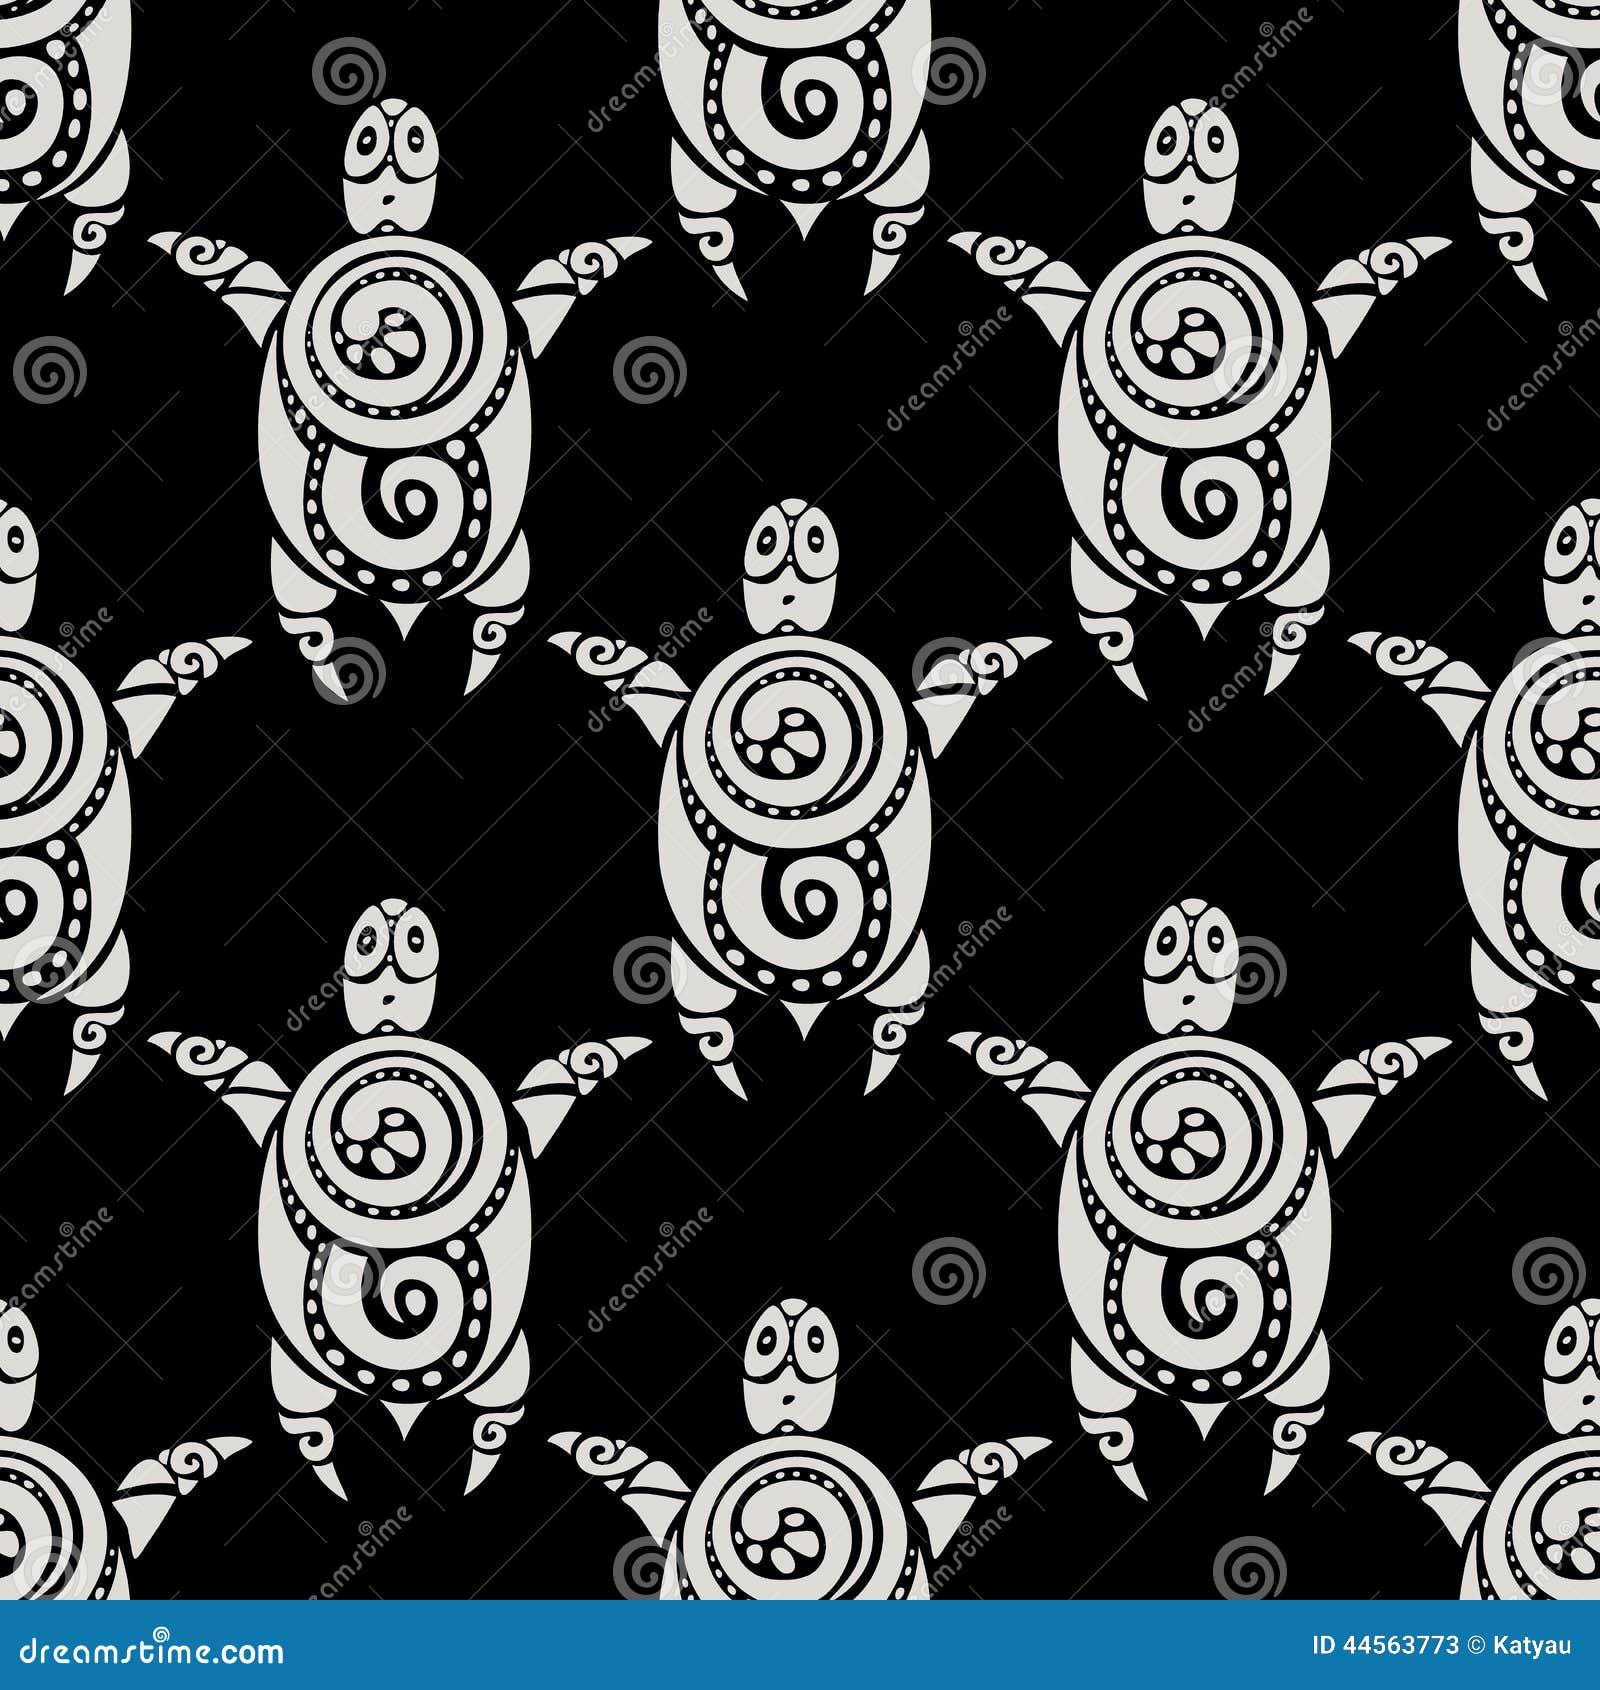 Polynesian Tribal Wallpaper: Sea Turtles. Seamless Vector Pattern. Stock Vector